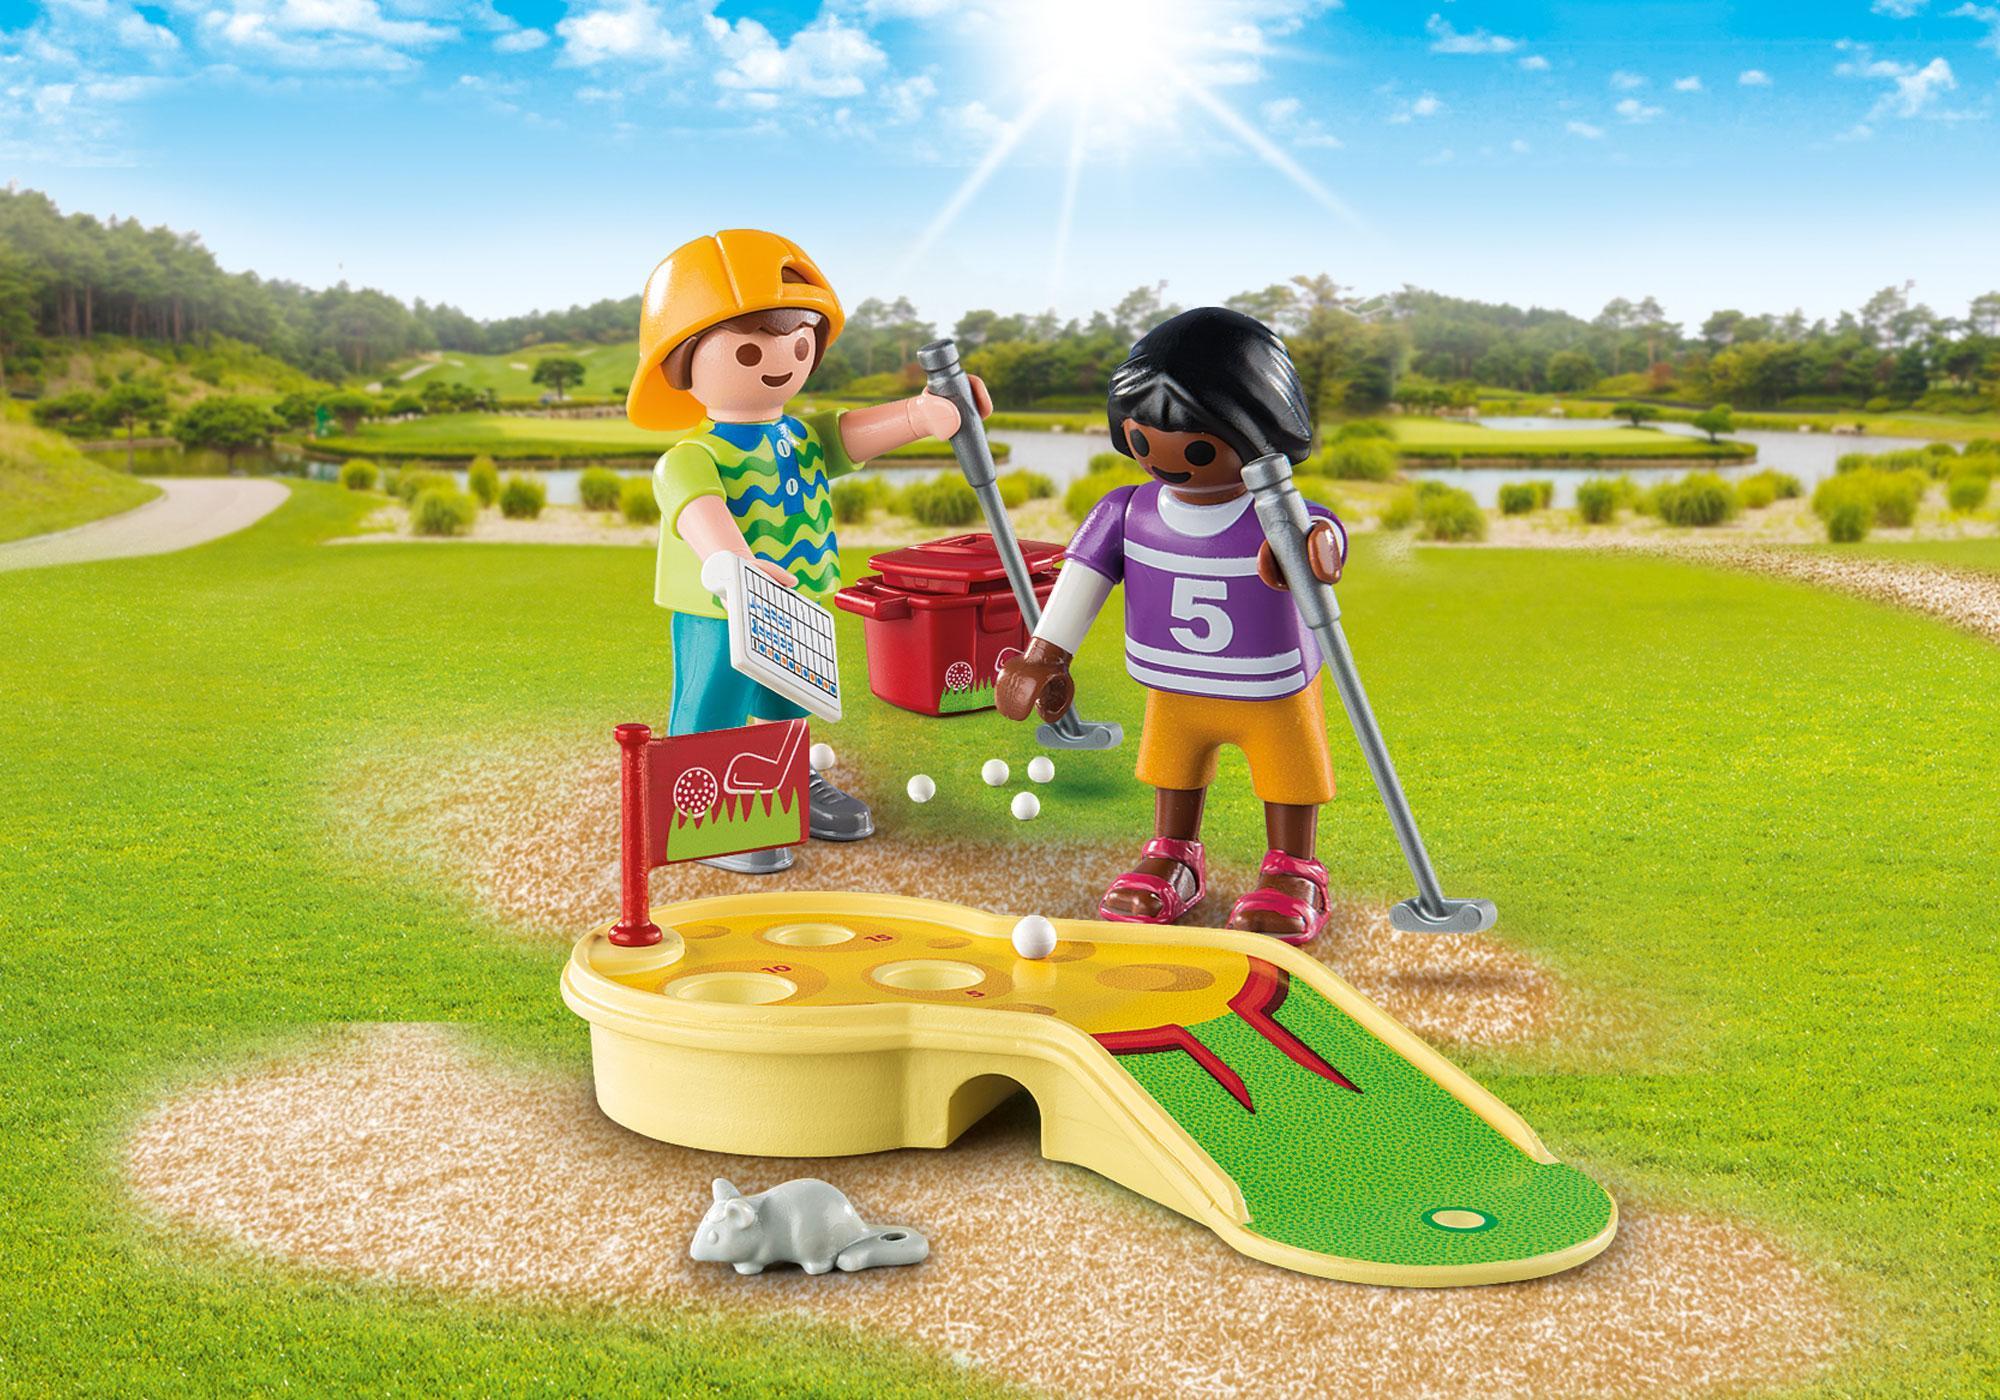 http://media.playmobil.com/i/playmobil/9439_product_detail/Kinder beim Minigolfspiel